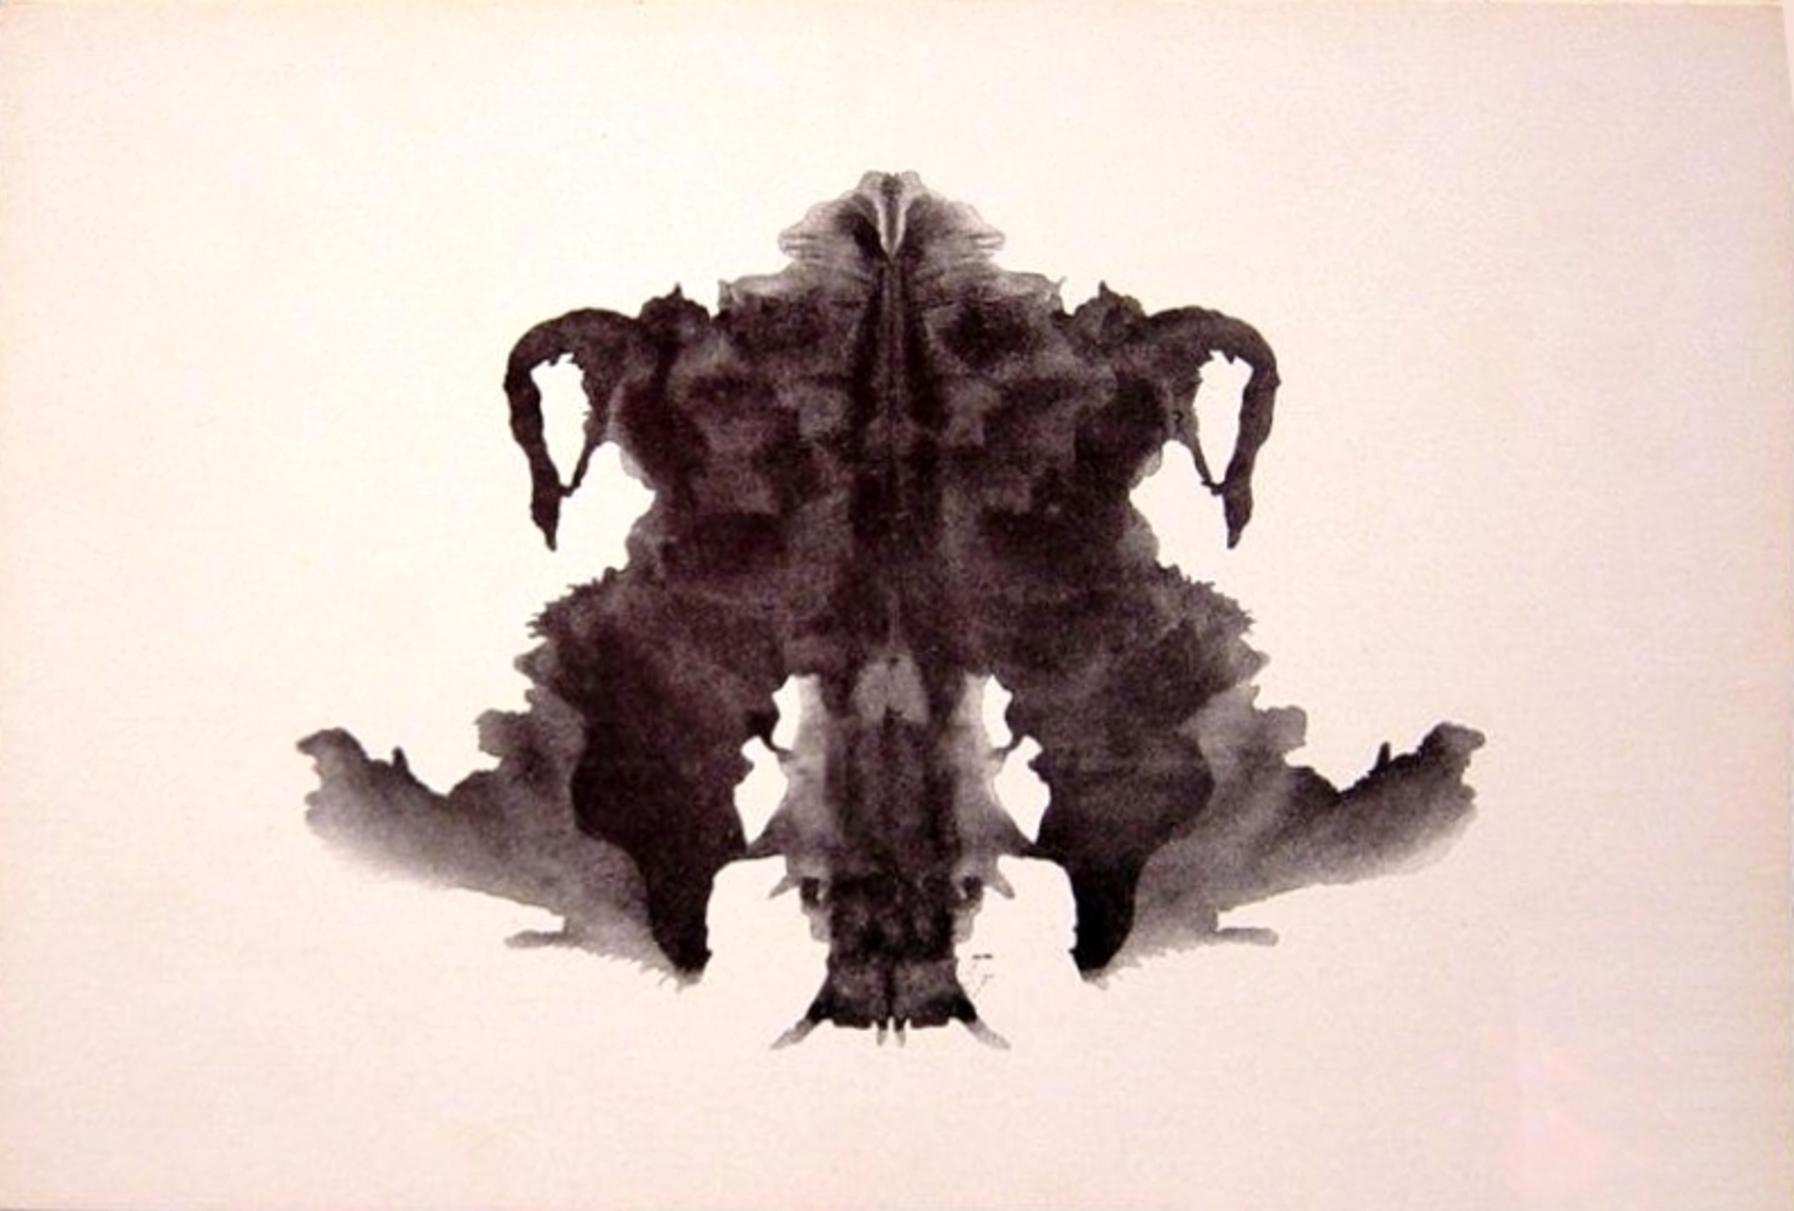 Rorschach psicologia test